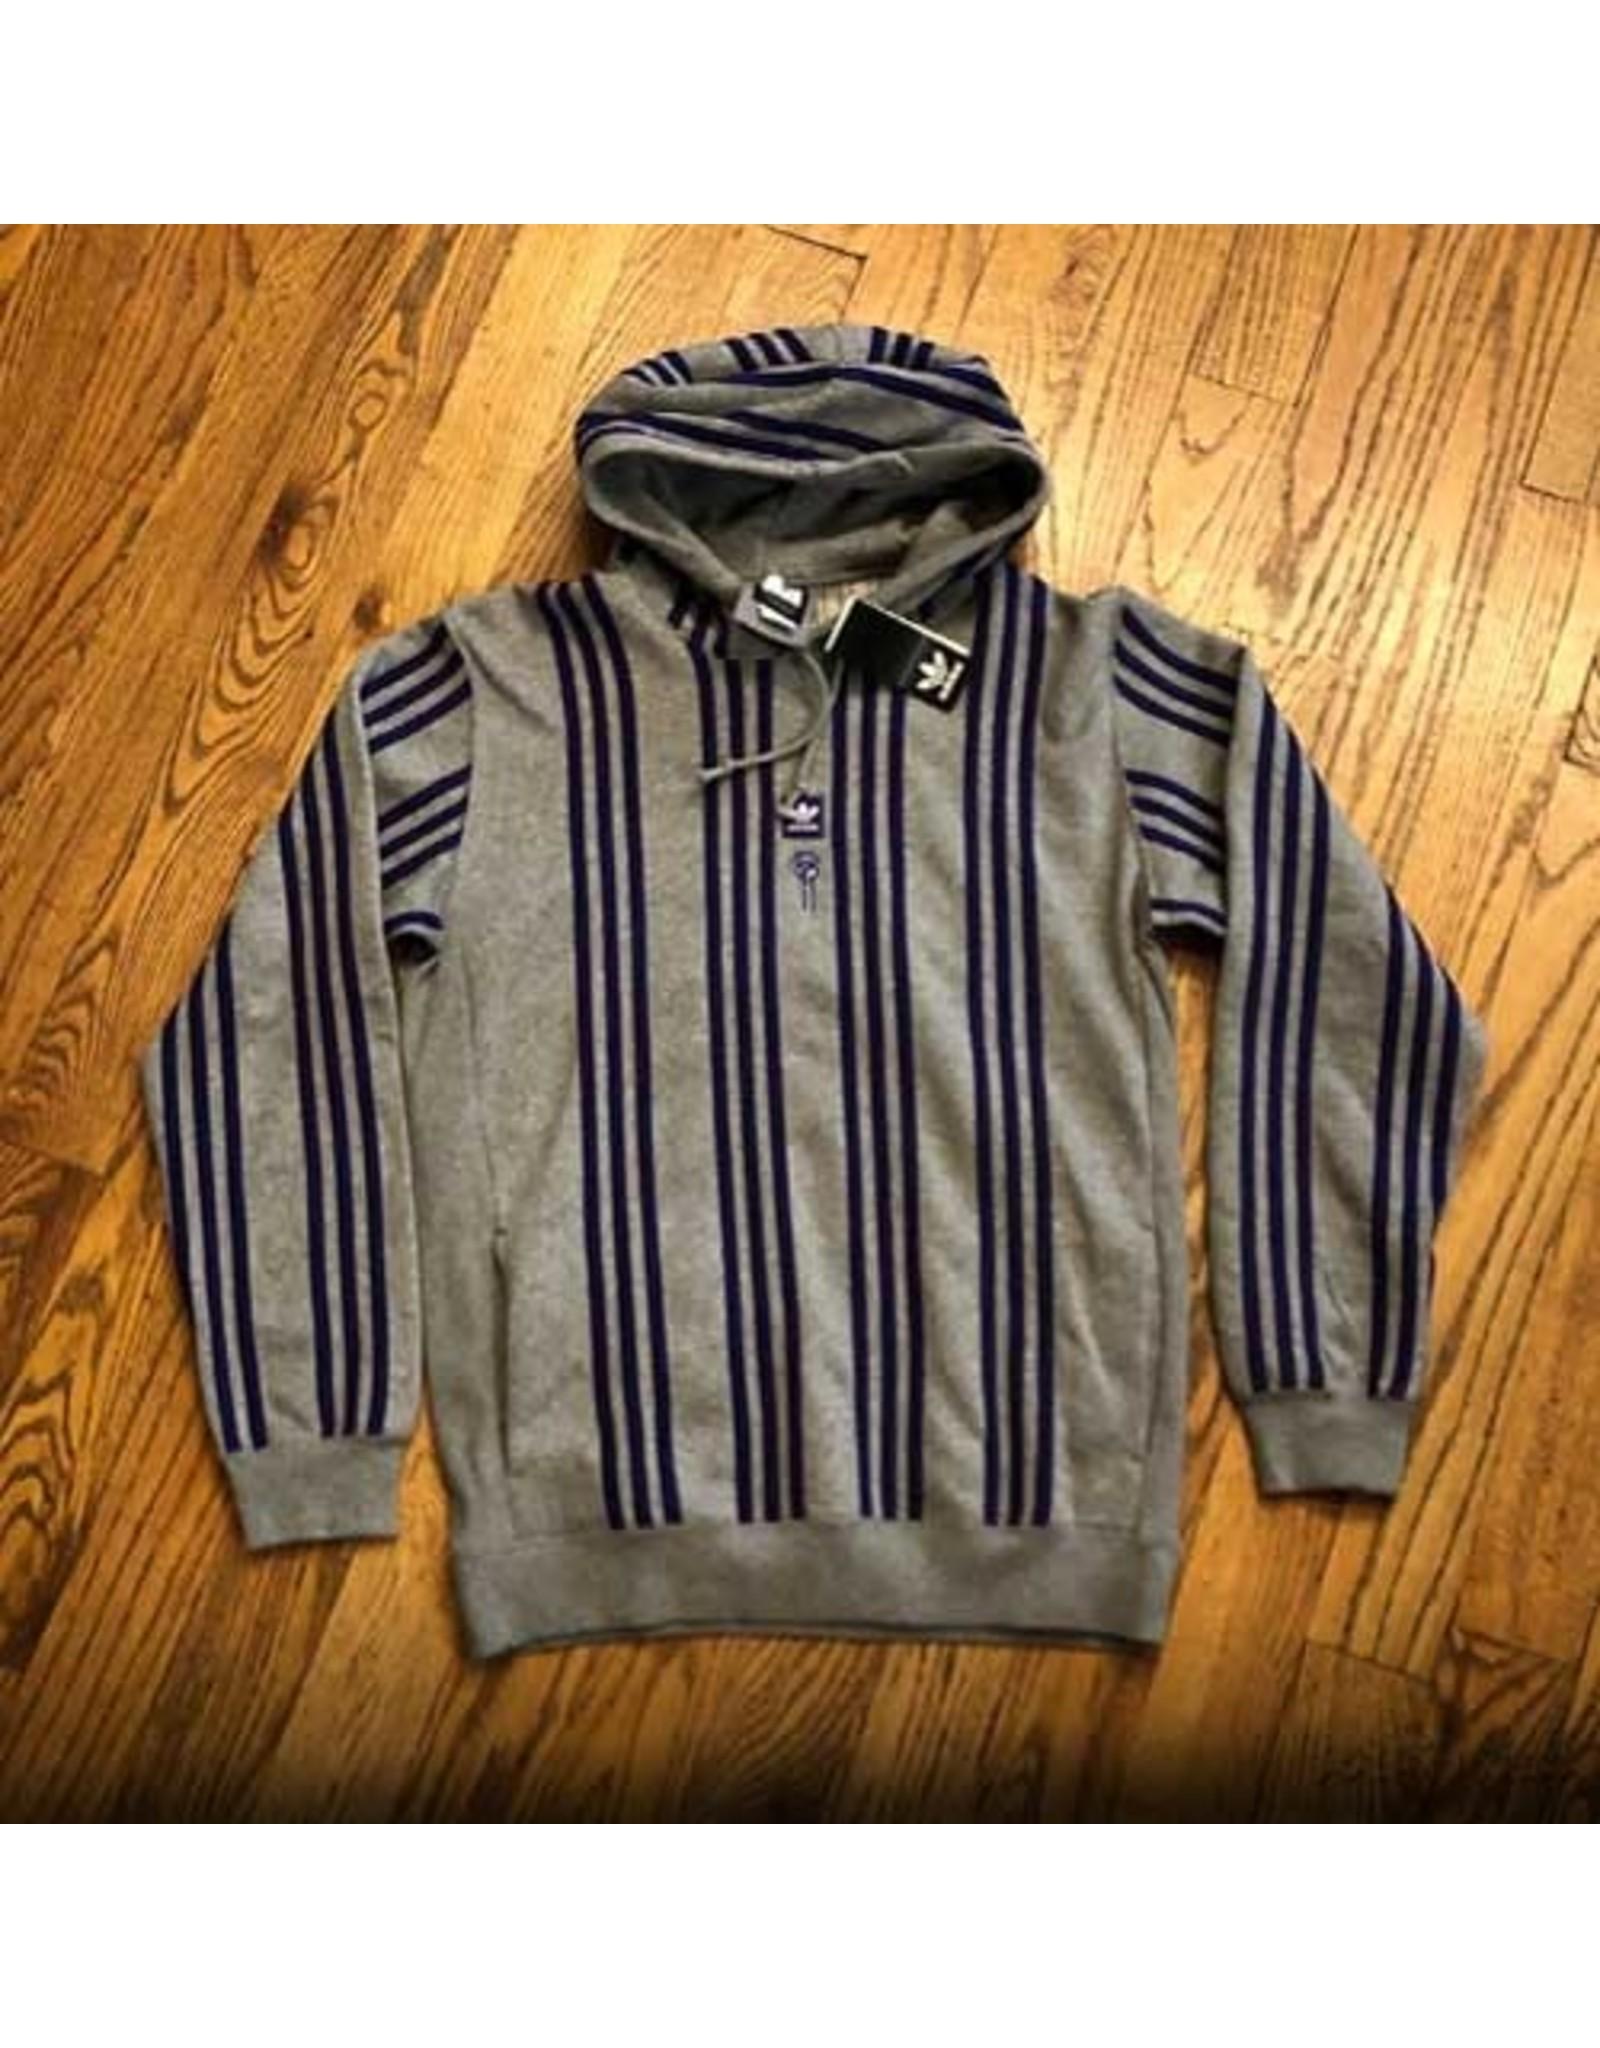 ADIDAS Adidas x Hardies Sport Gray with Purple Stripes